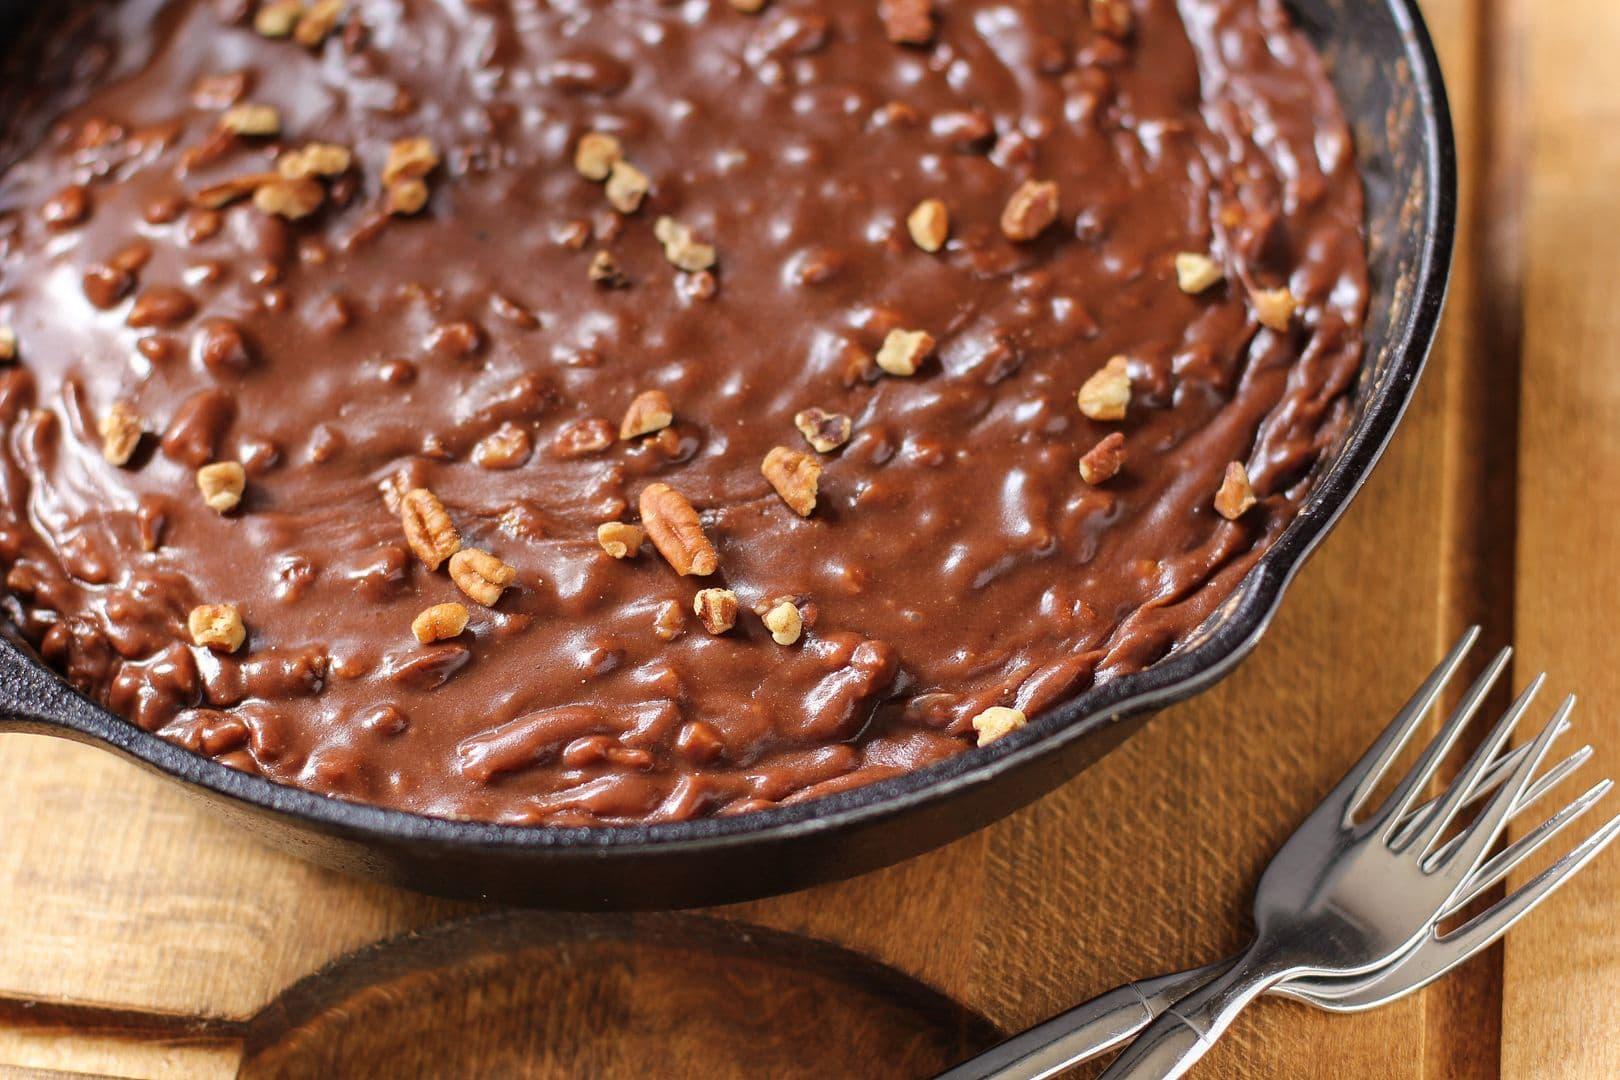 Gooey Chocolate Skillet Cake